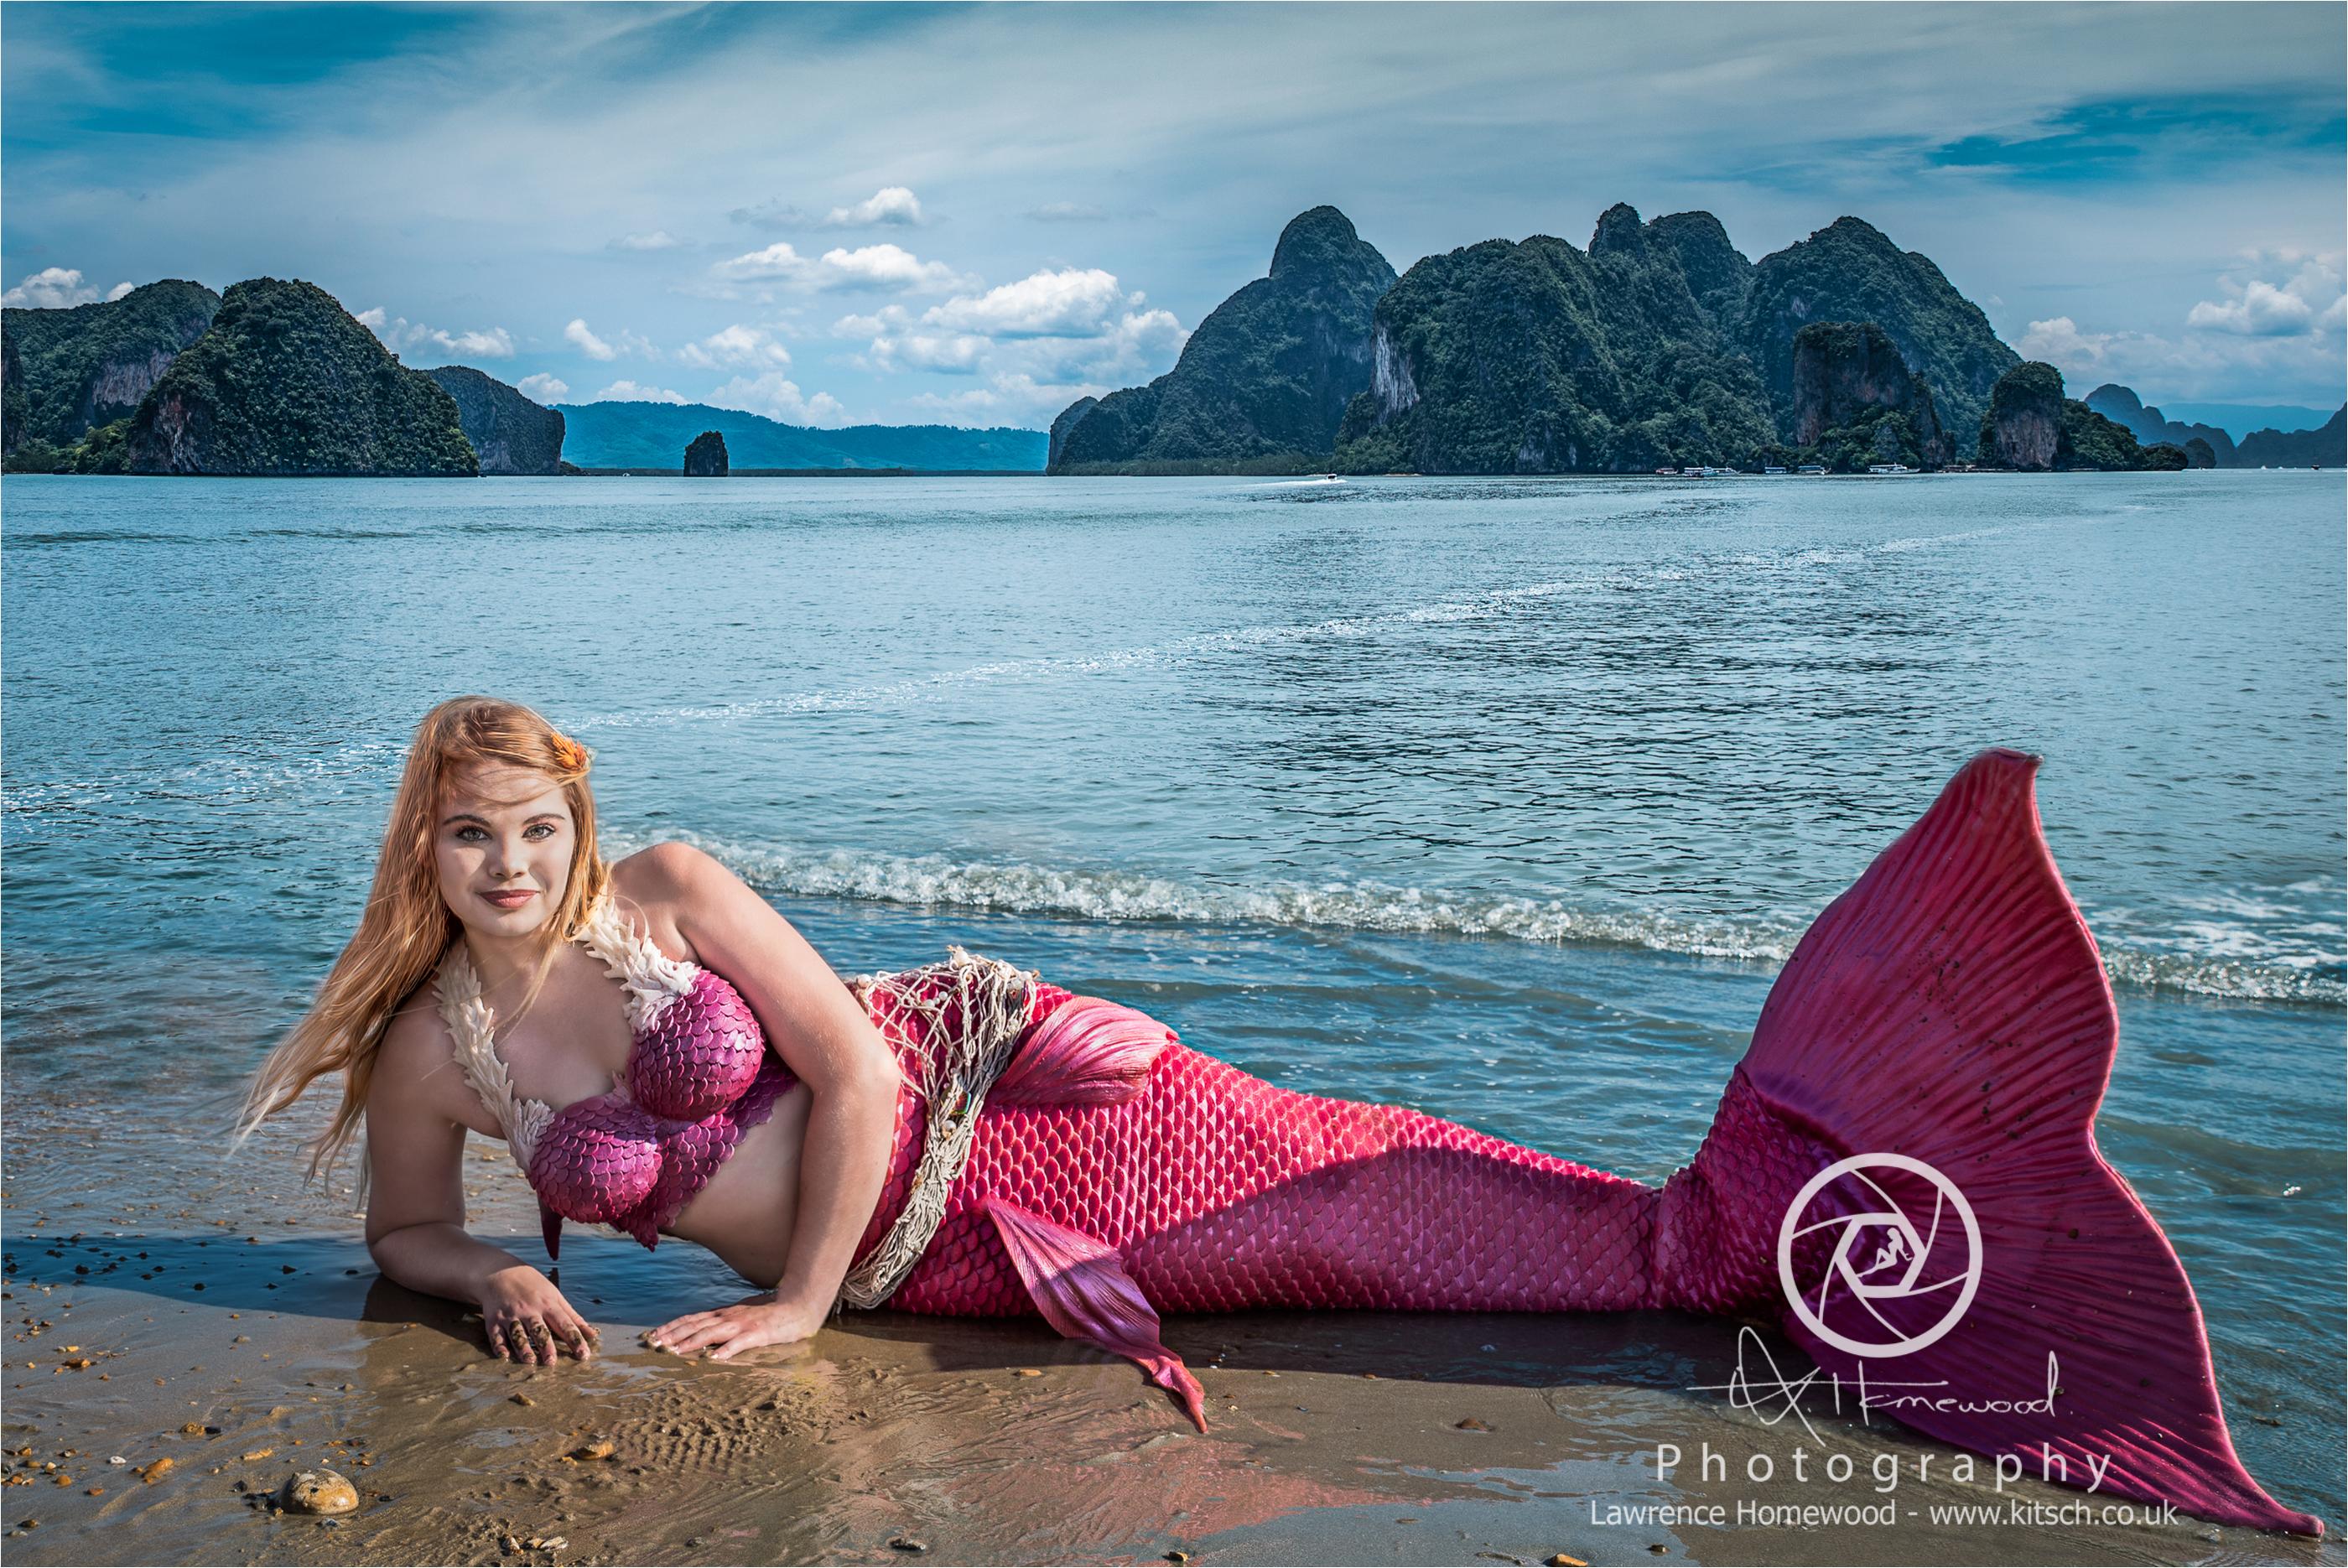 Pink Mermaid on the Beach redone